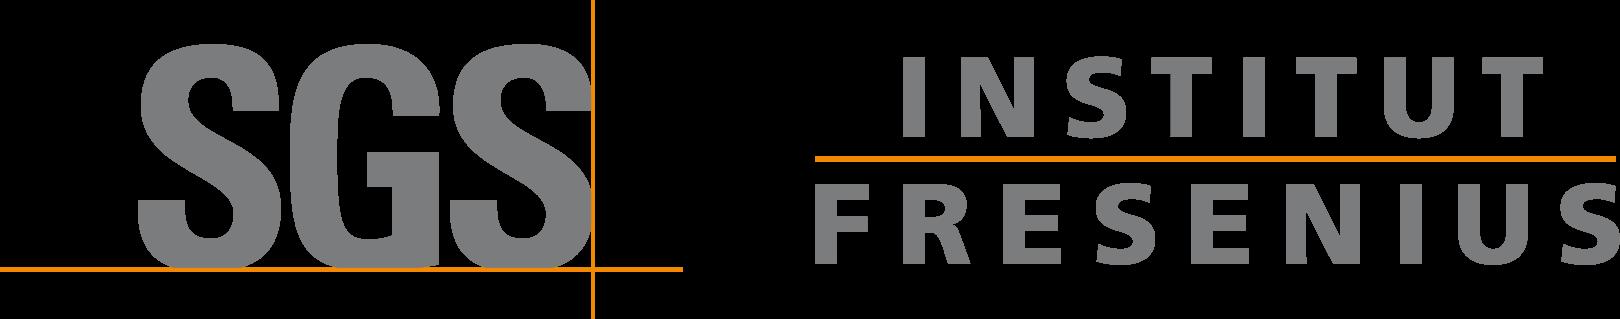 File:sgs Fresenius Logo 2012.svg - Fresenius, Transparent background PNG HD thumbnail